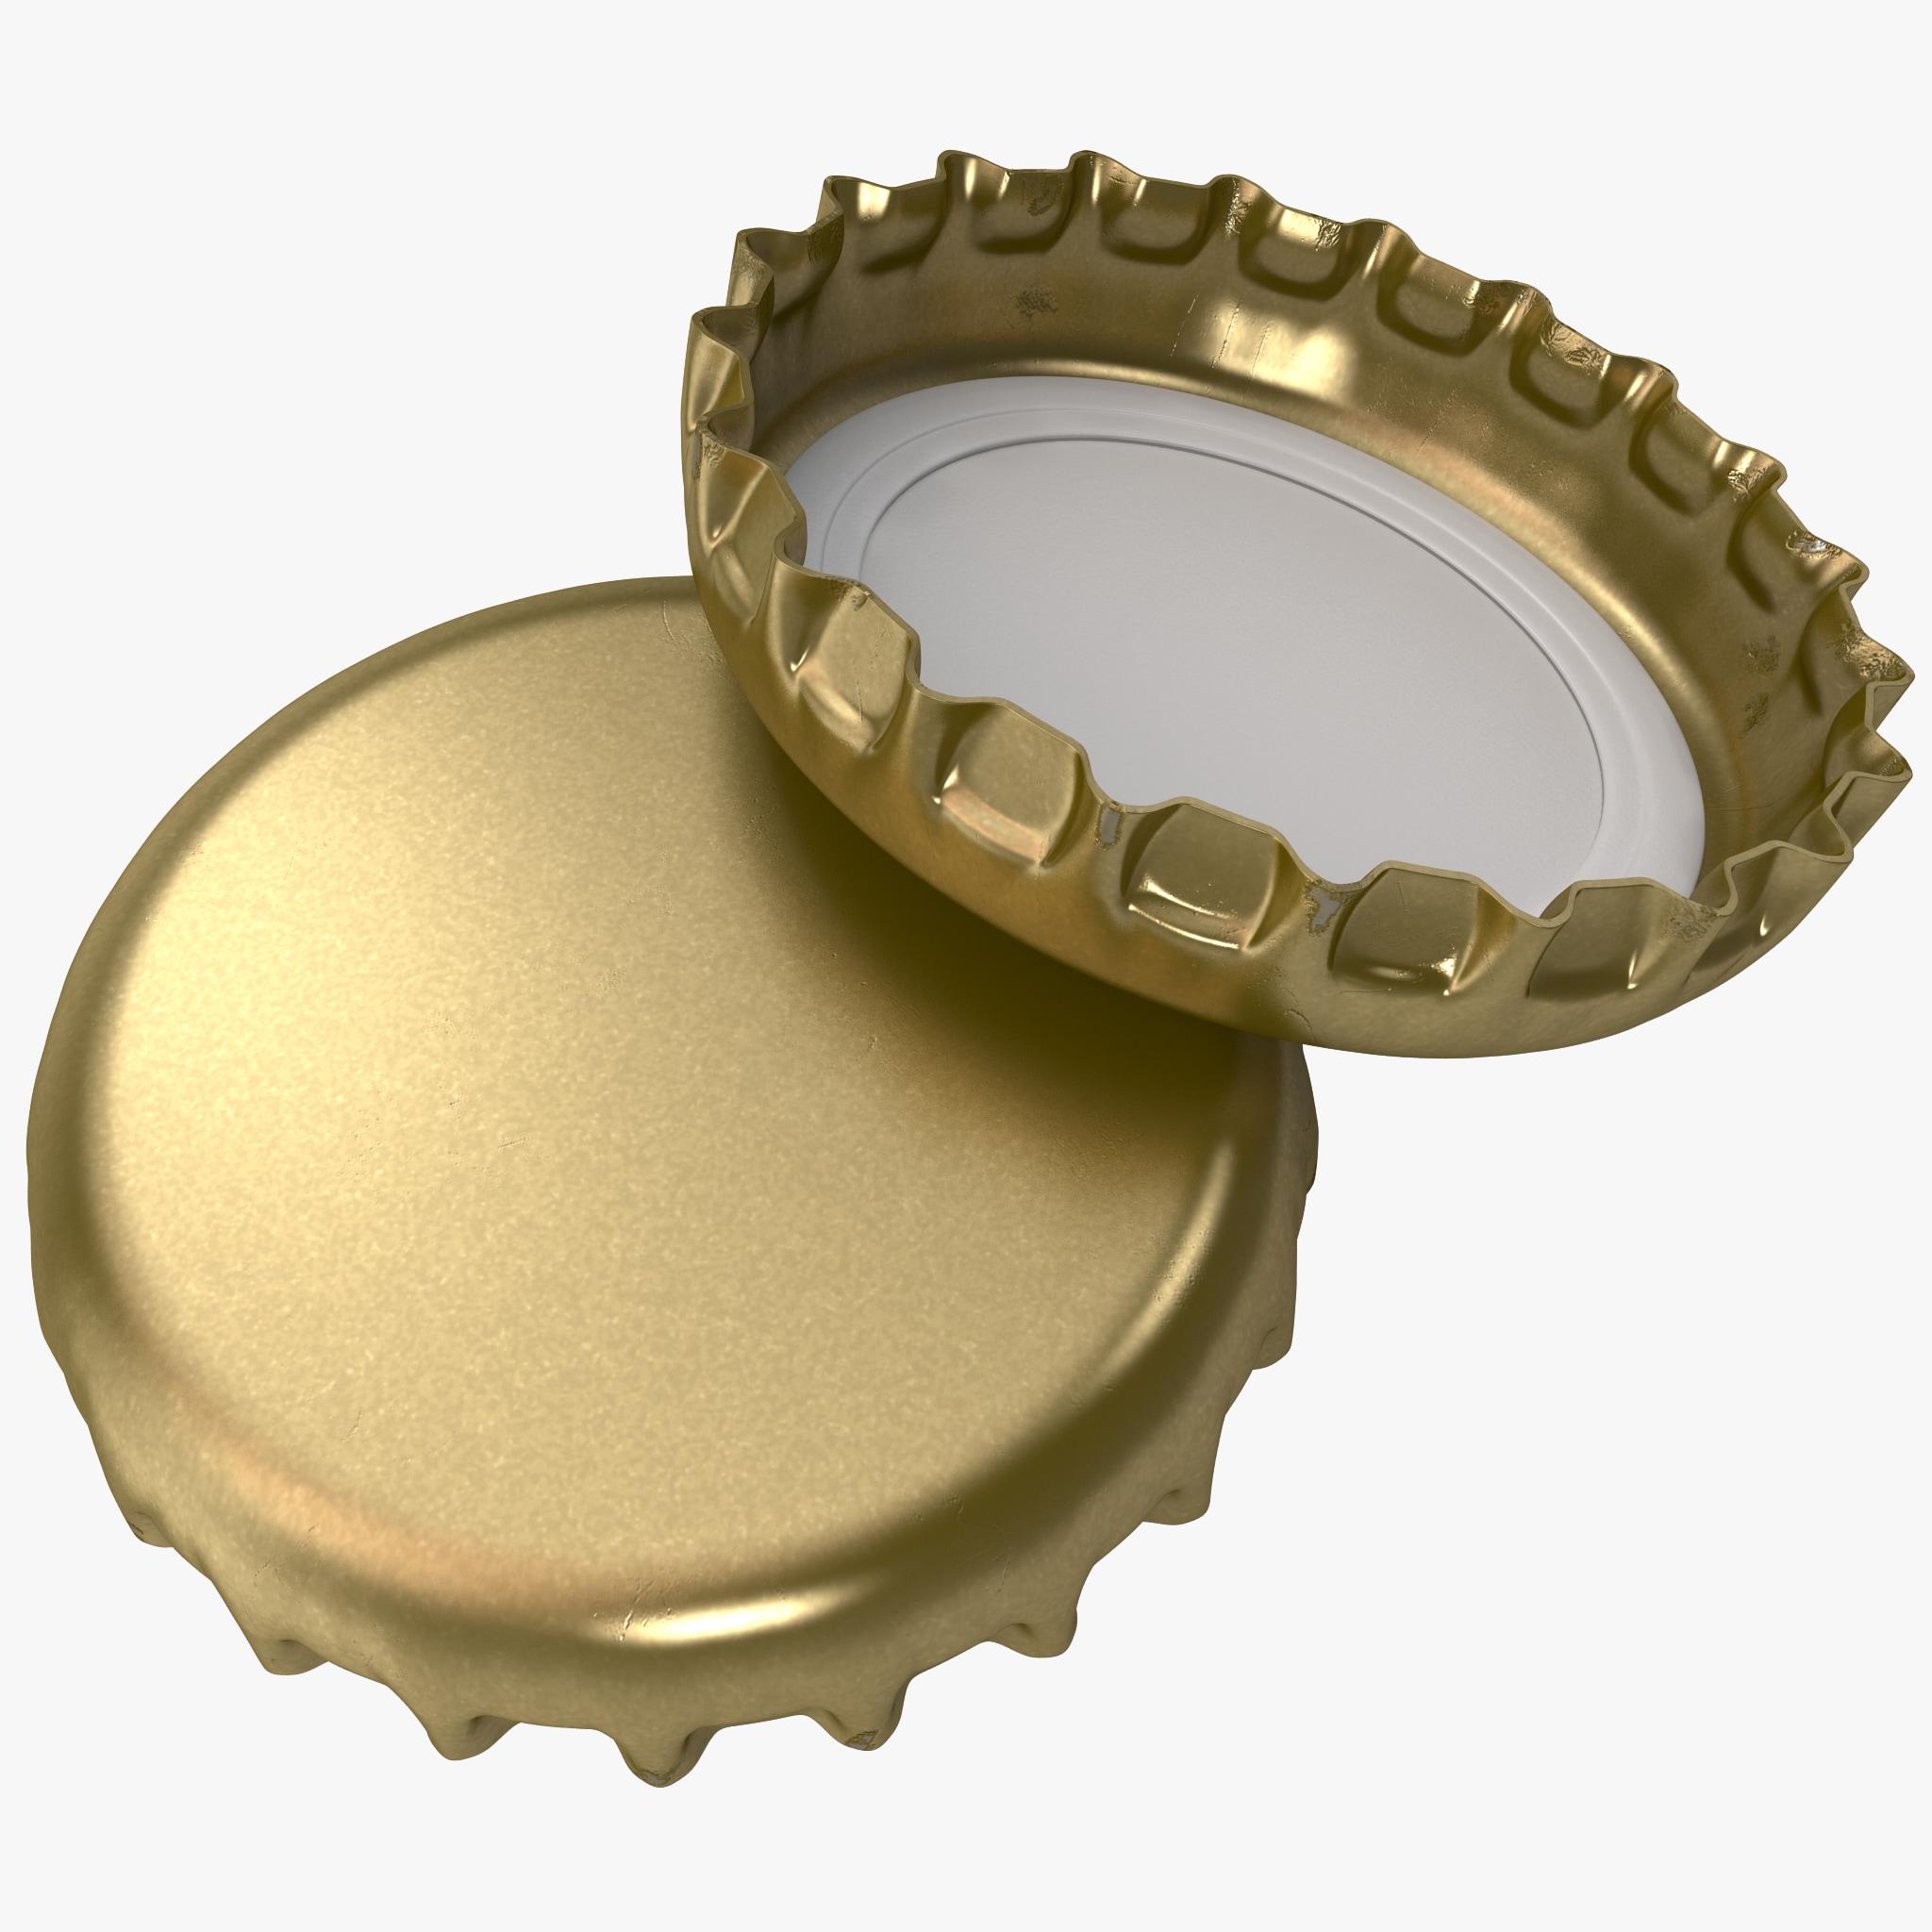 crown cork bottle cap 3d model